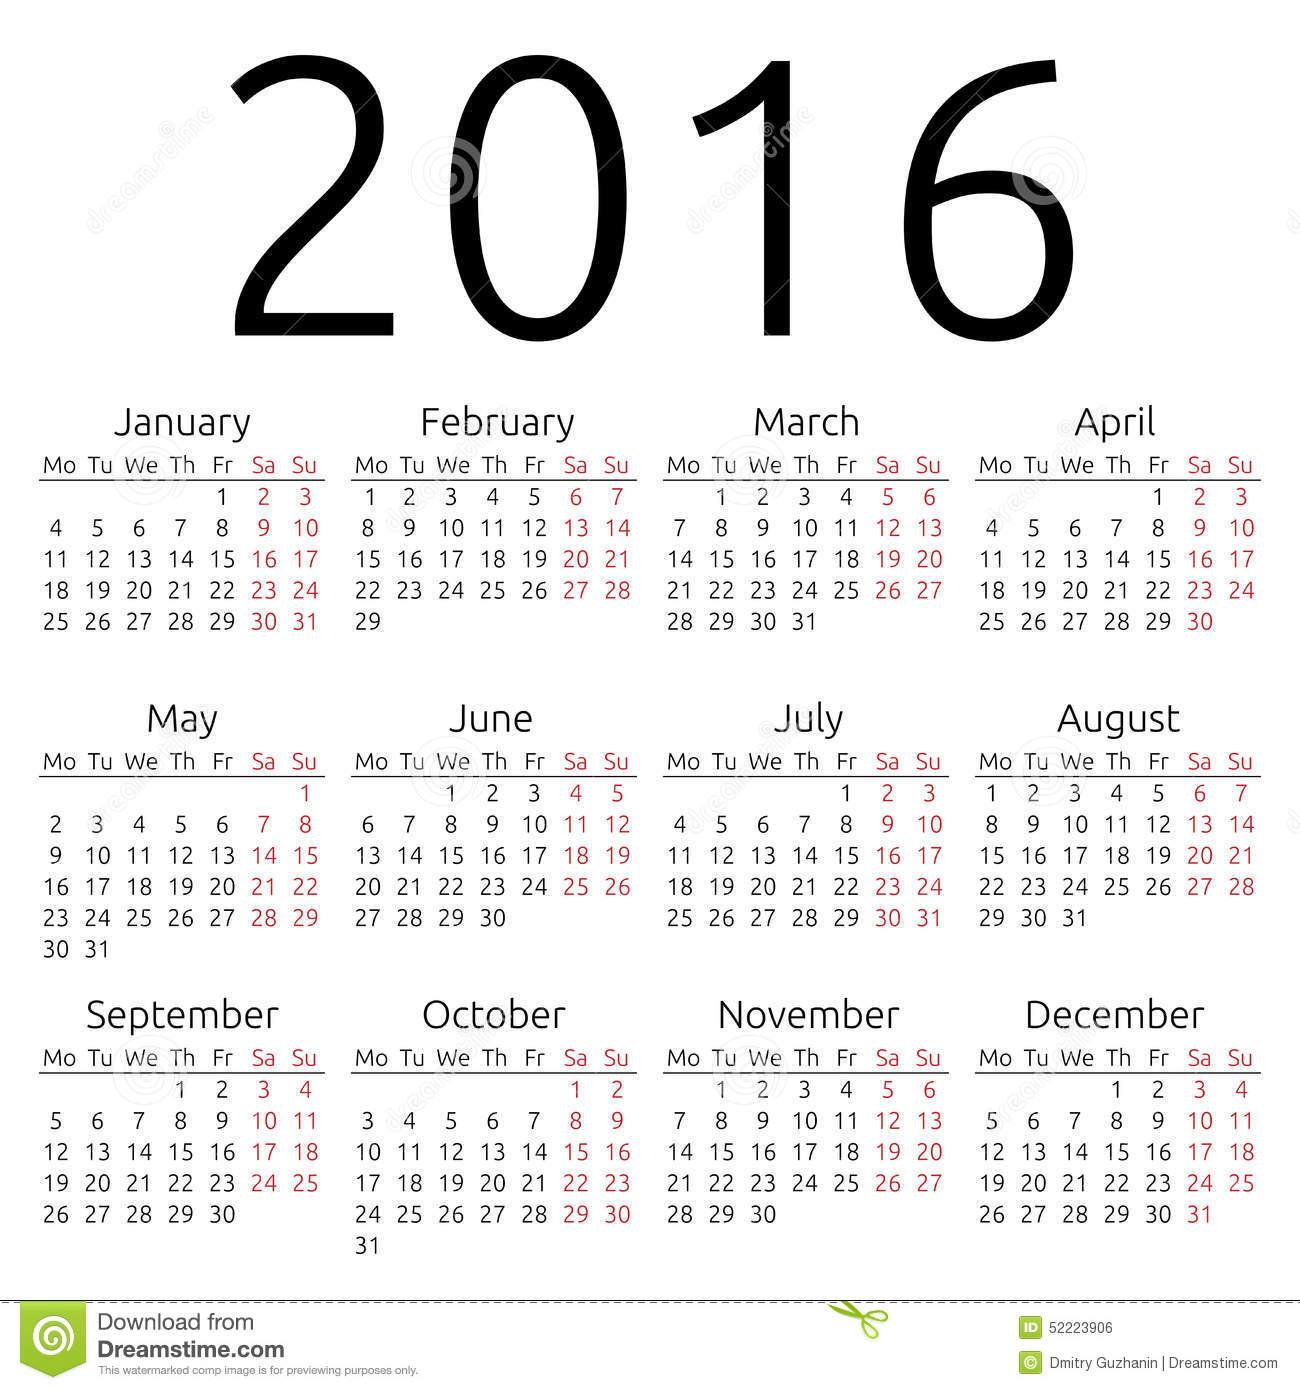 2016 Year Calendar Printable